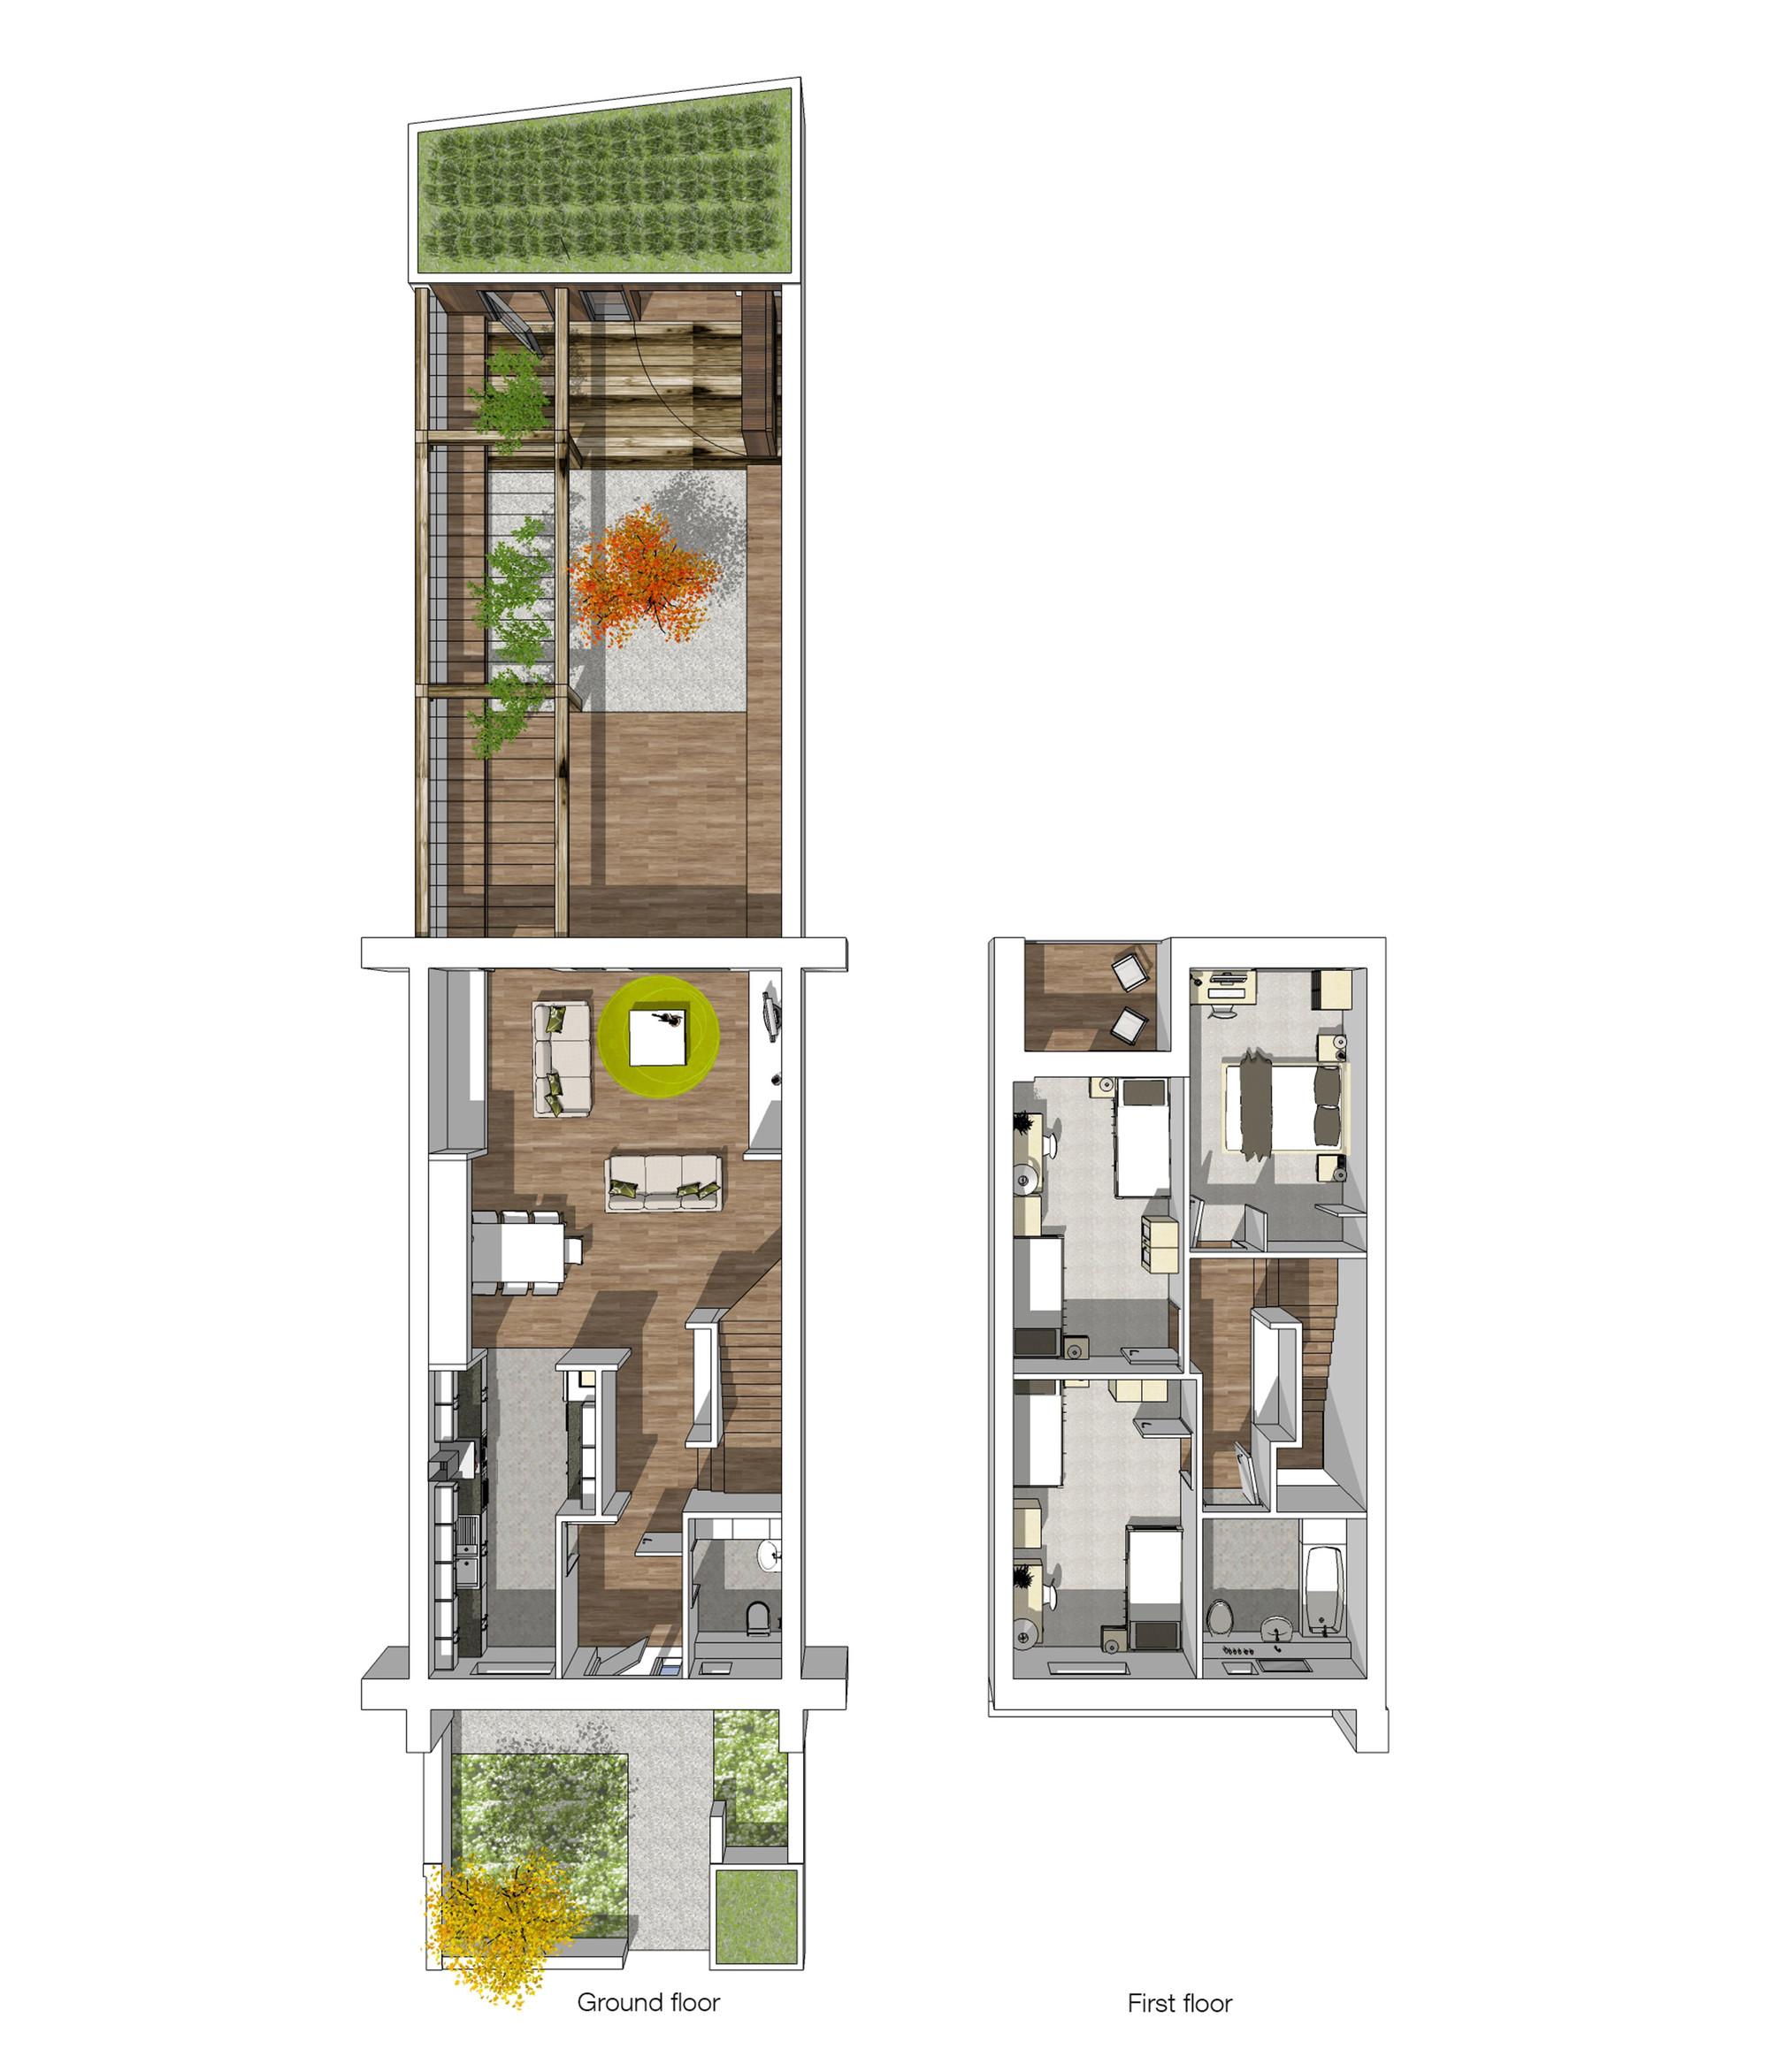 Gallery of Inventive Council Housing / Levitt Bernstein - 18